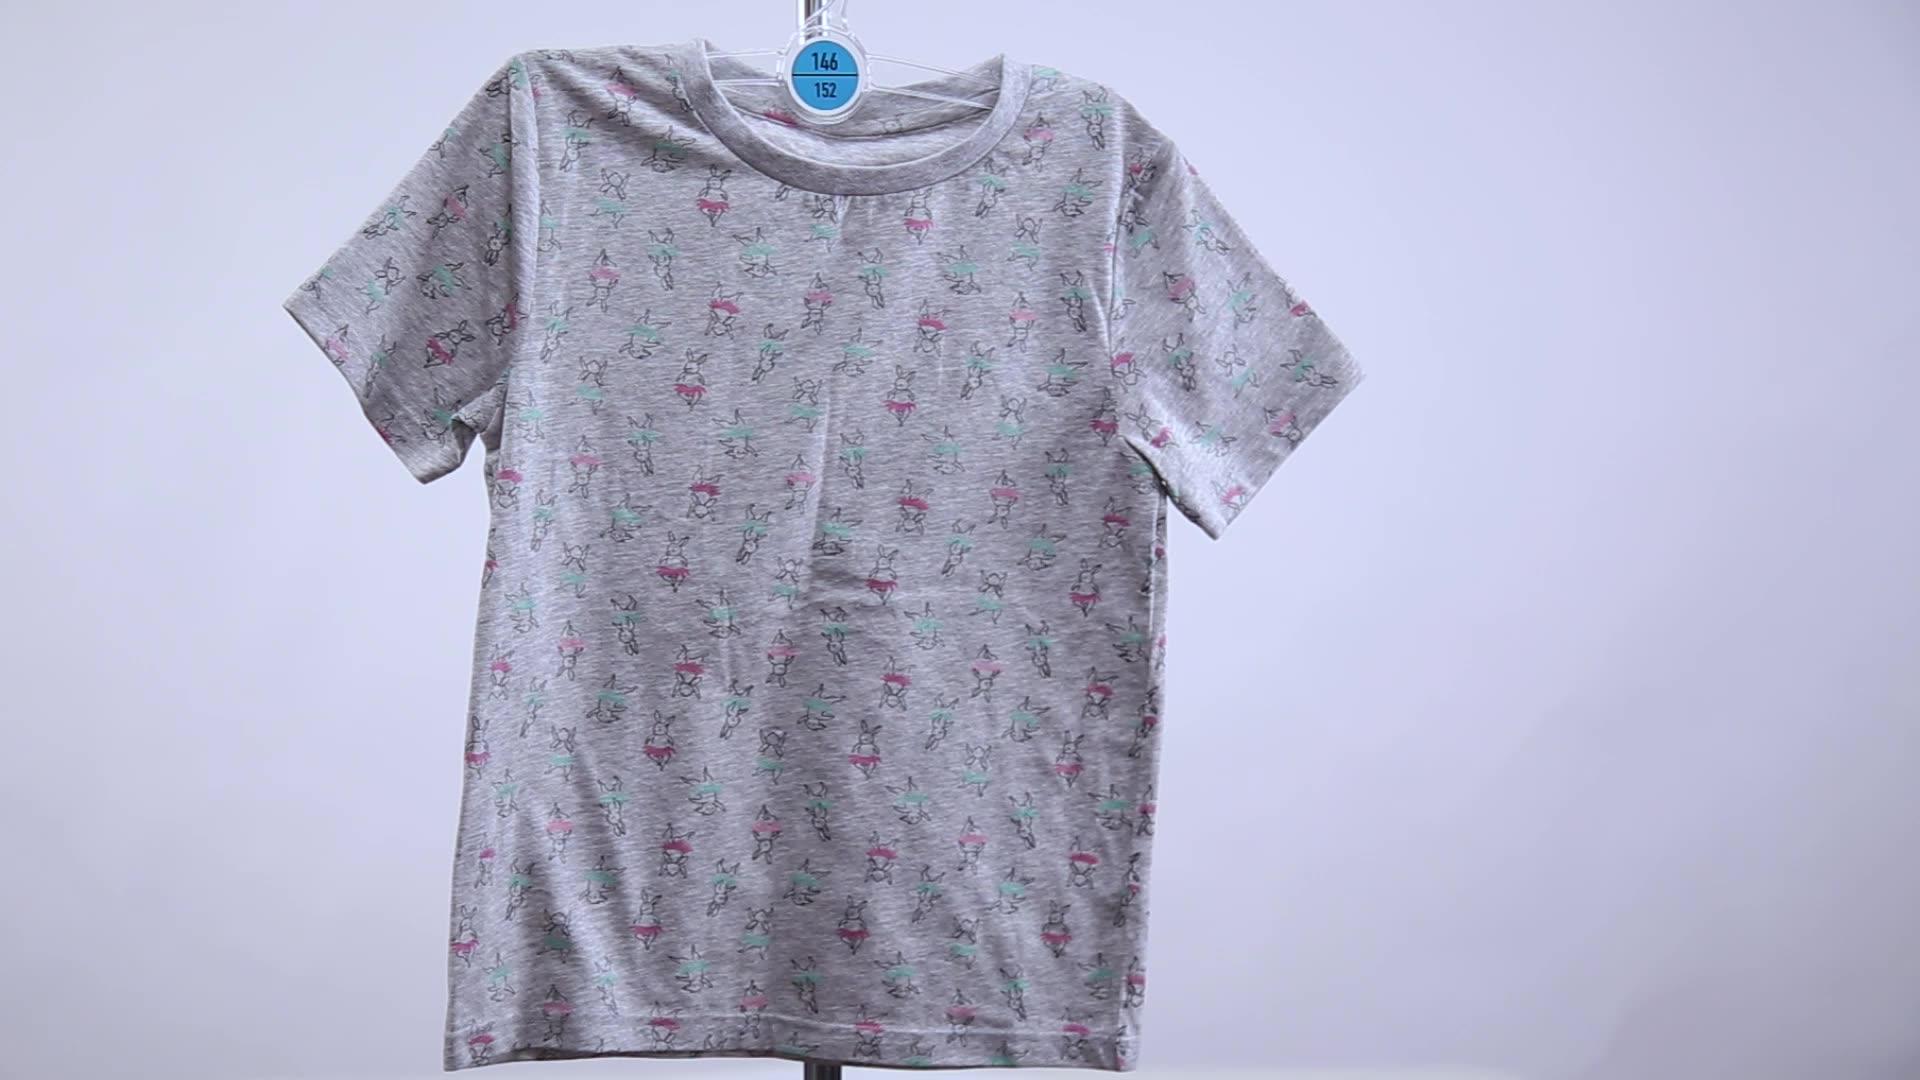 short sleeve cute clothes set,kids white t-shirt sets,solid cotton shirt kids